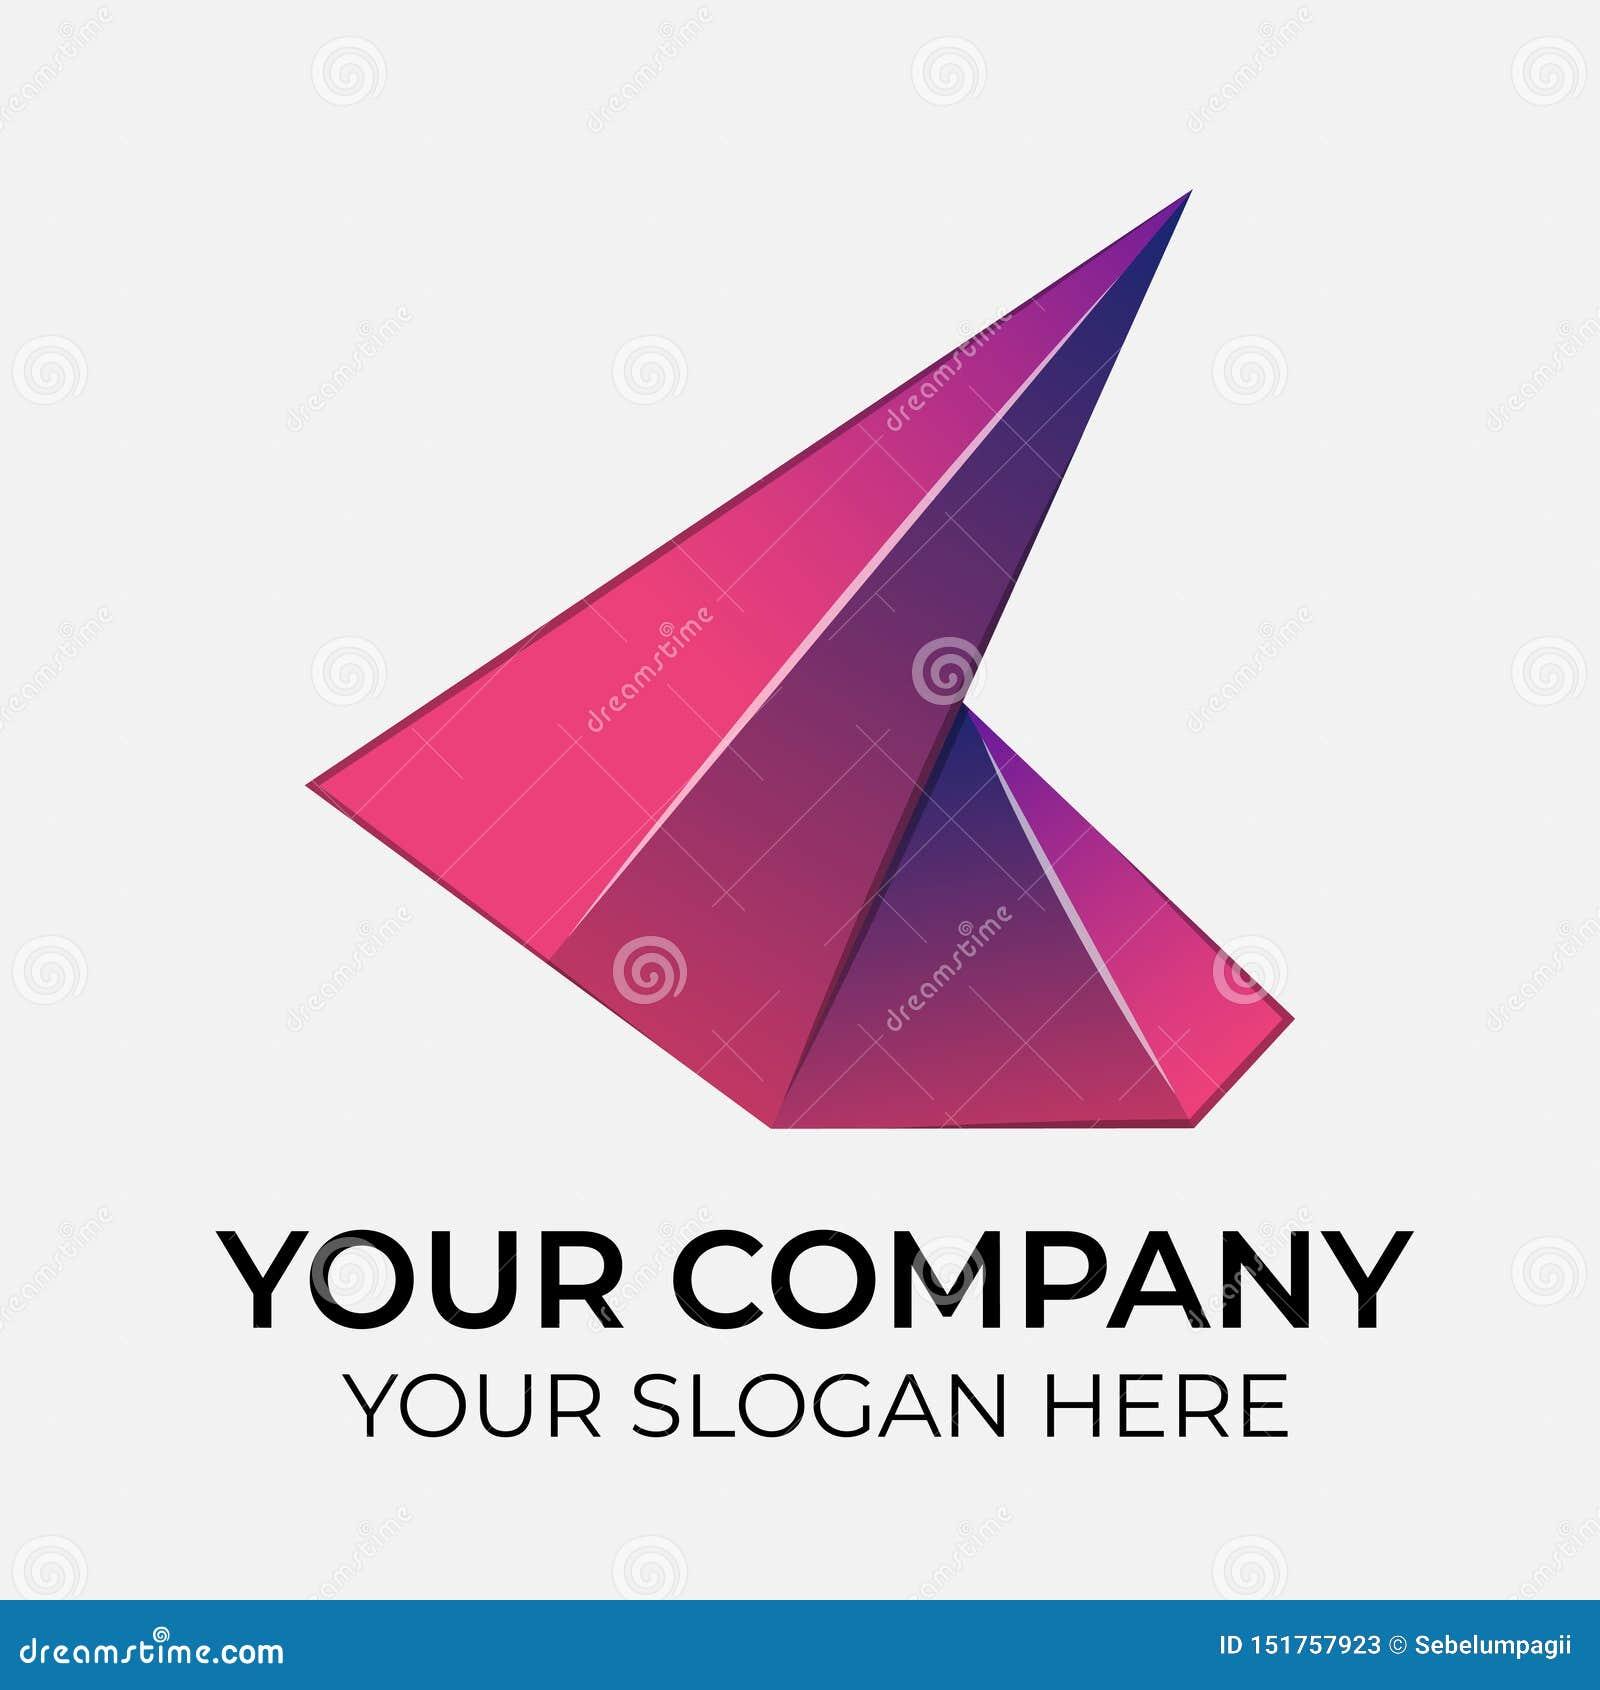 Colorful vector logo design